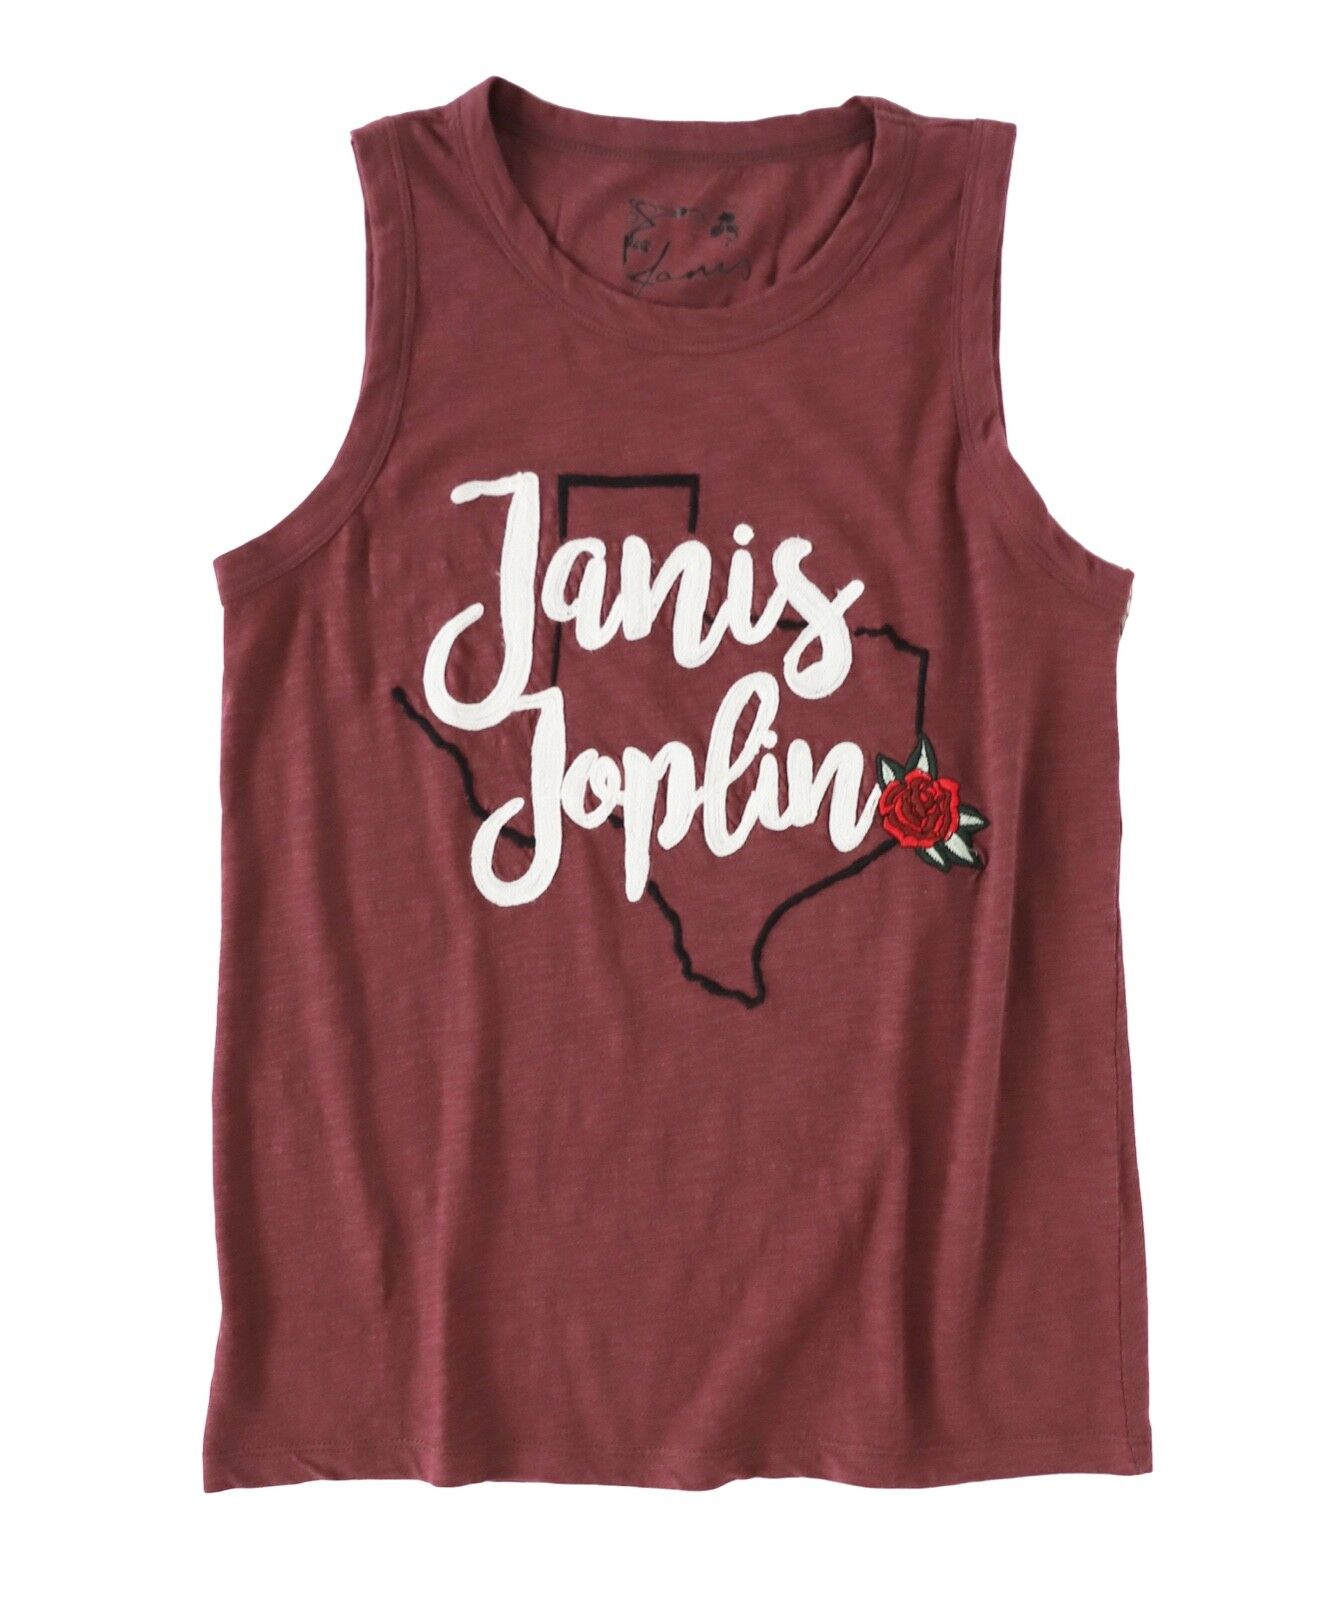 Lucky Brand - Donna XS - Nuova Nuova Nuova con Etichetta  49 - Rosso Janis Joplin Texas 8394cf